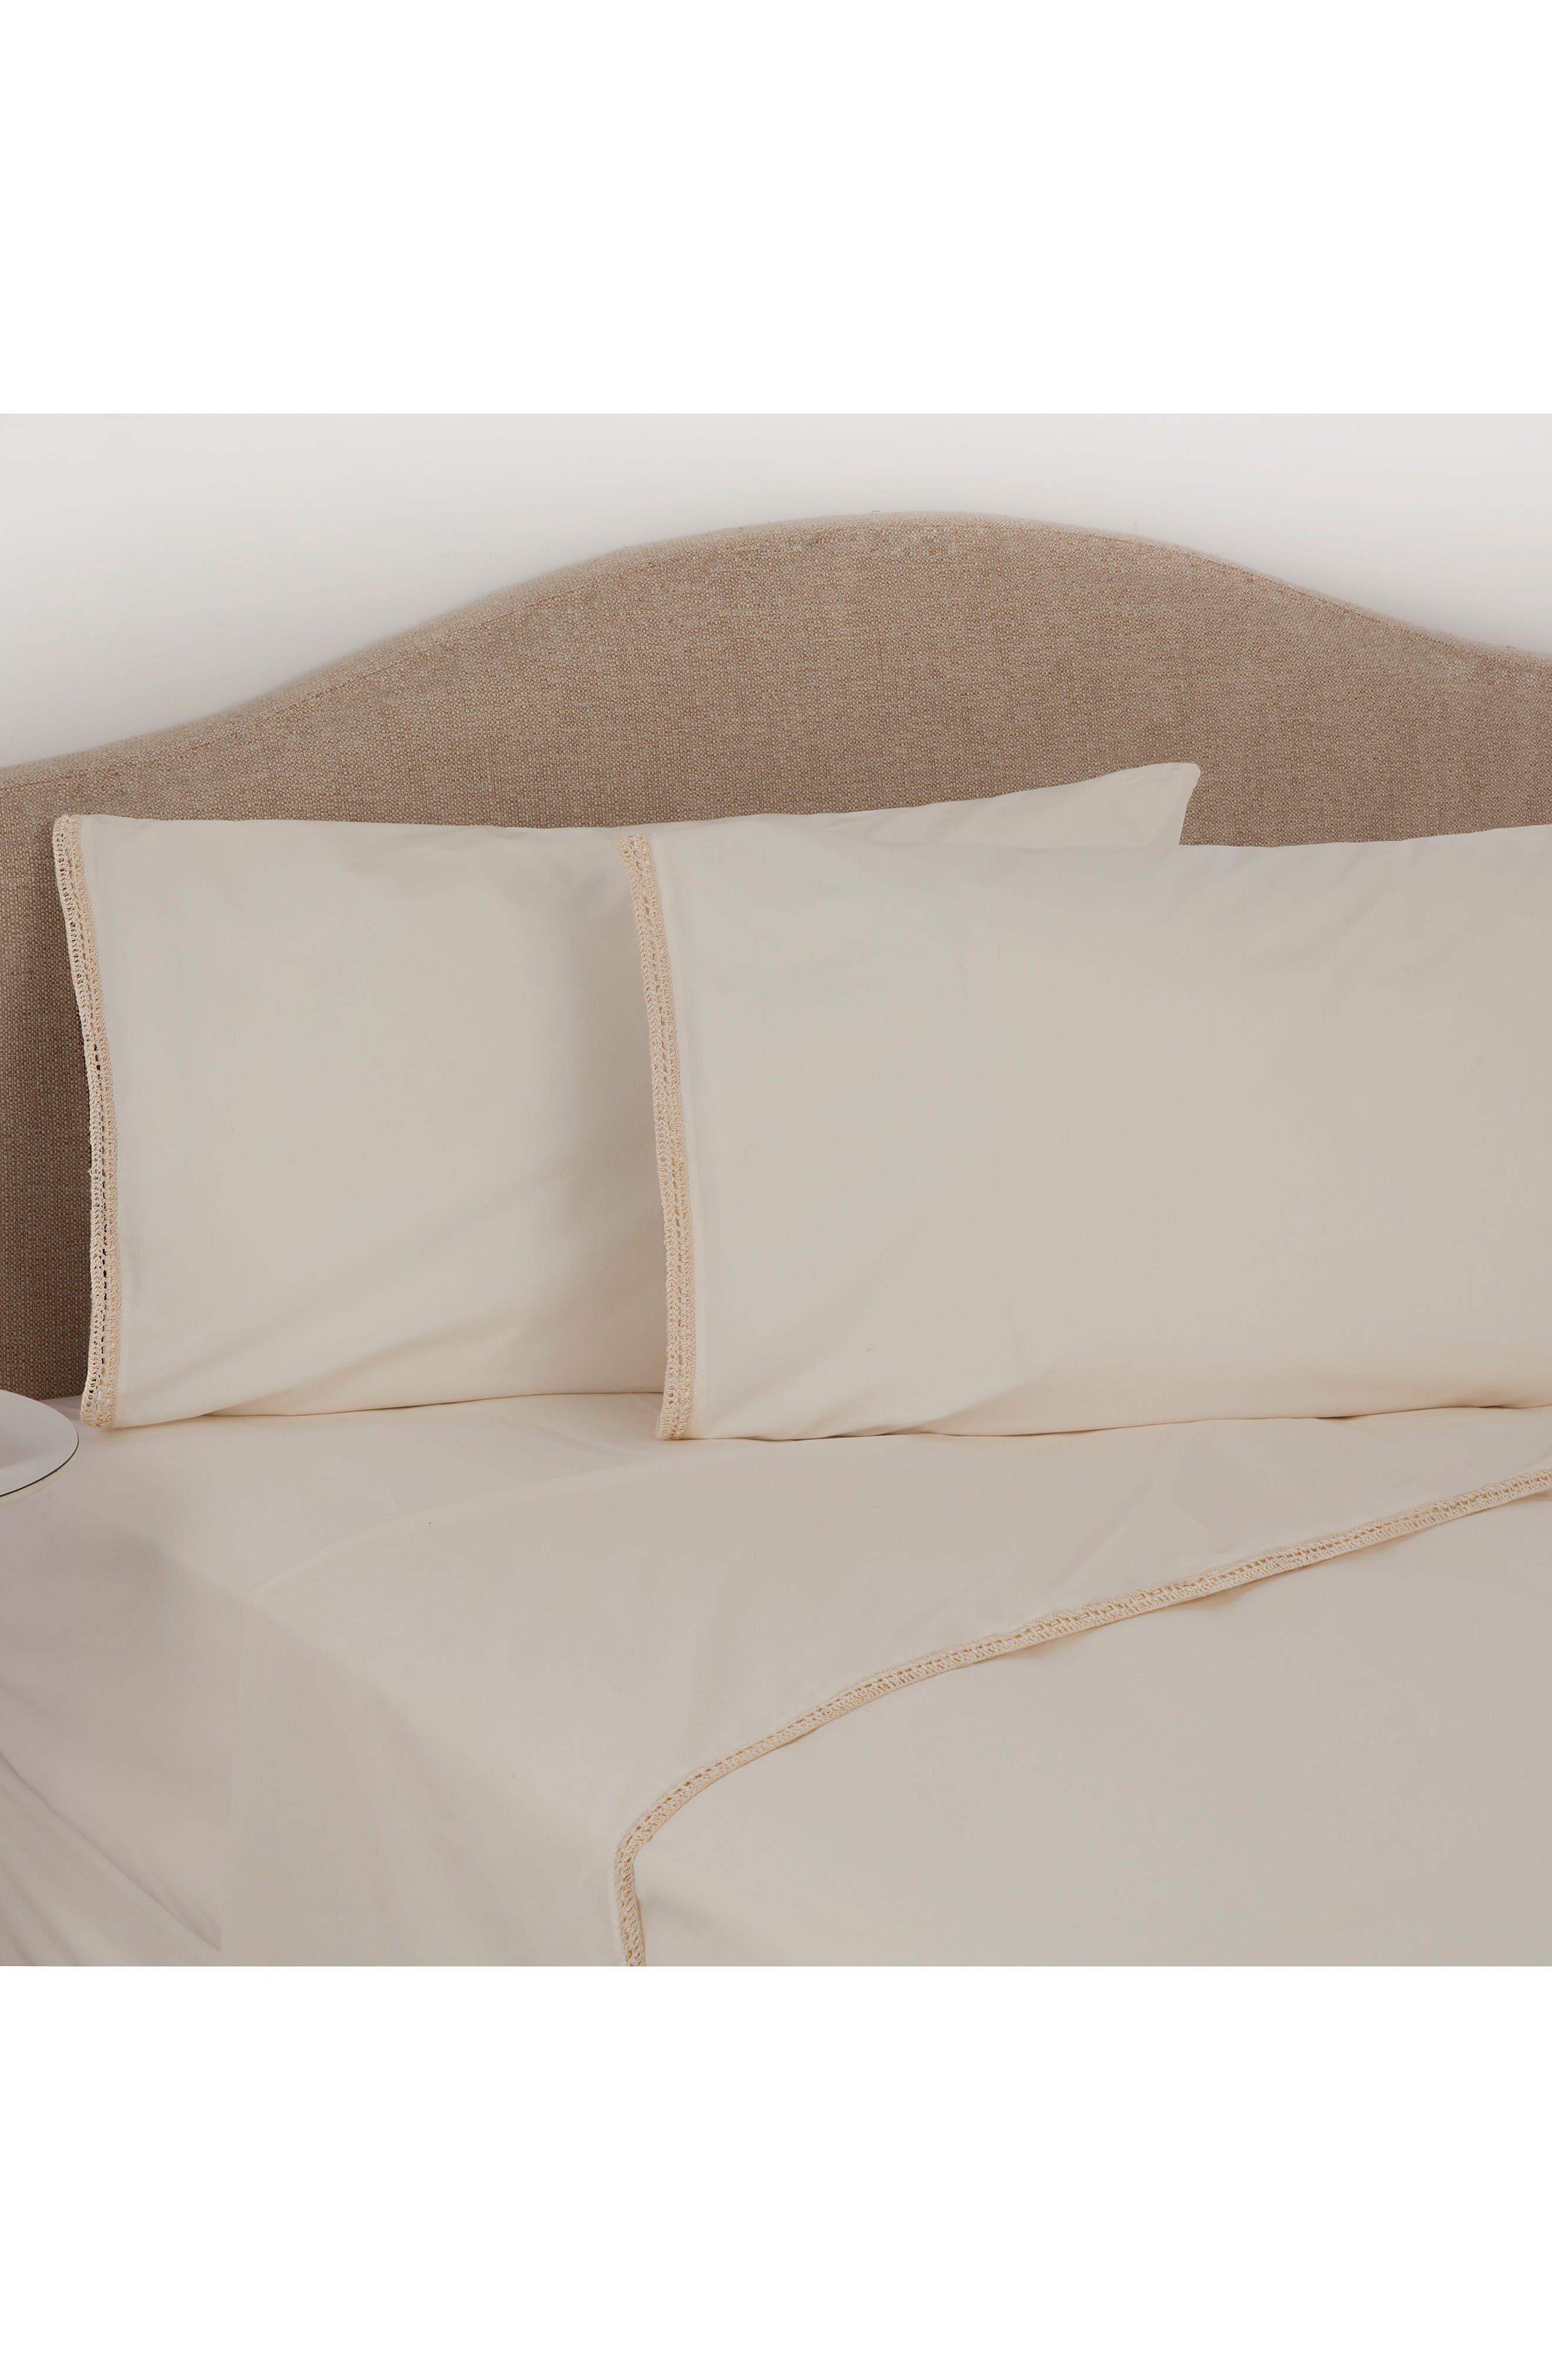 Alternate Image 1 Selected - Portico Crochet Trim Pillowcases